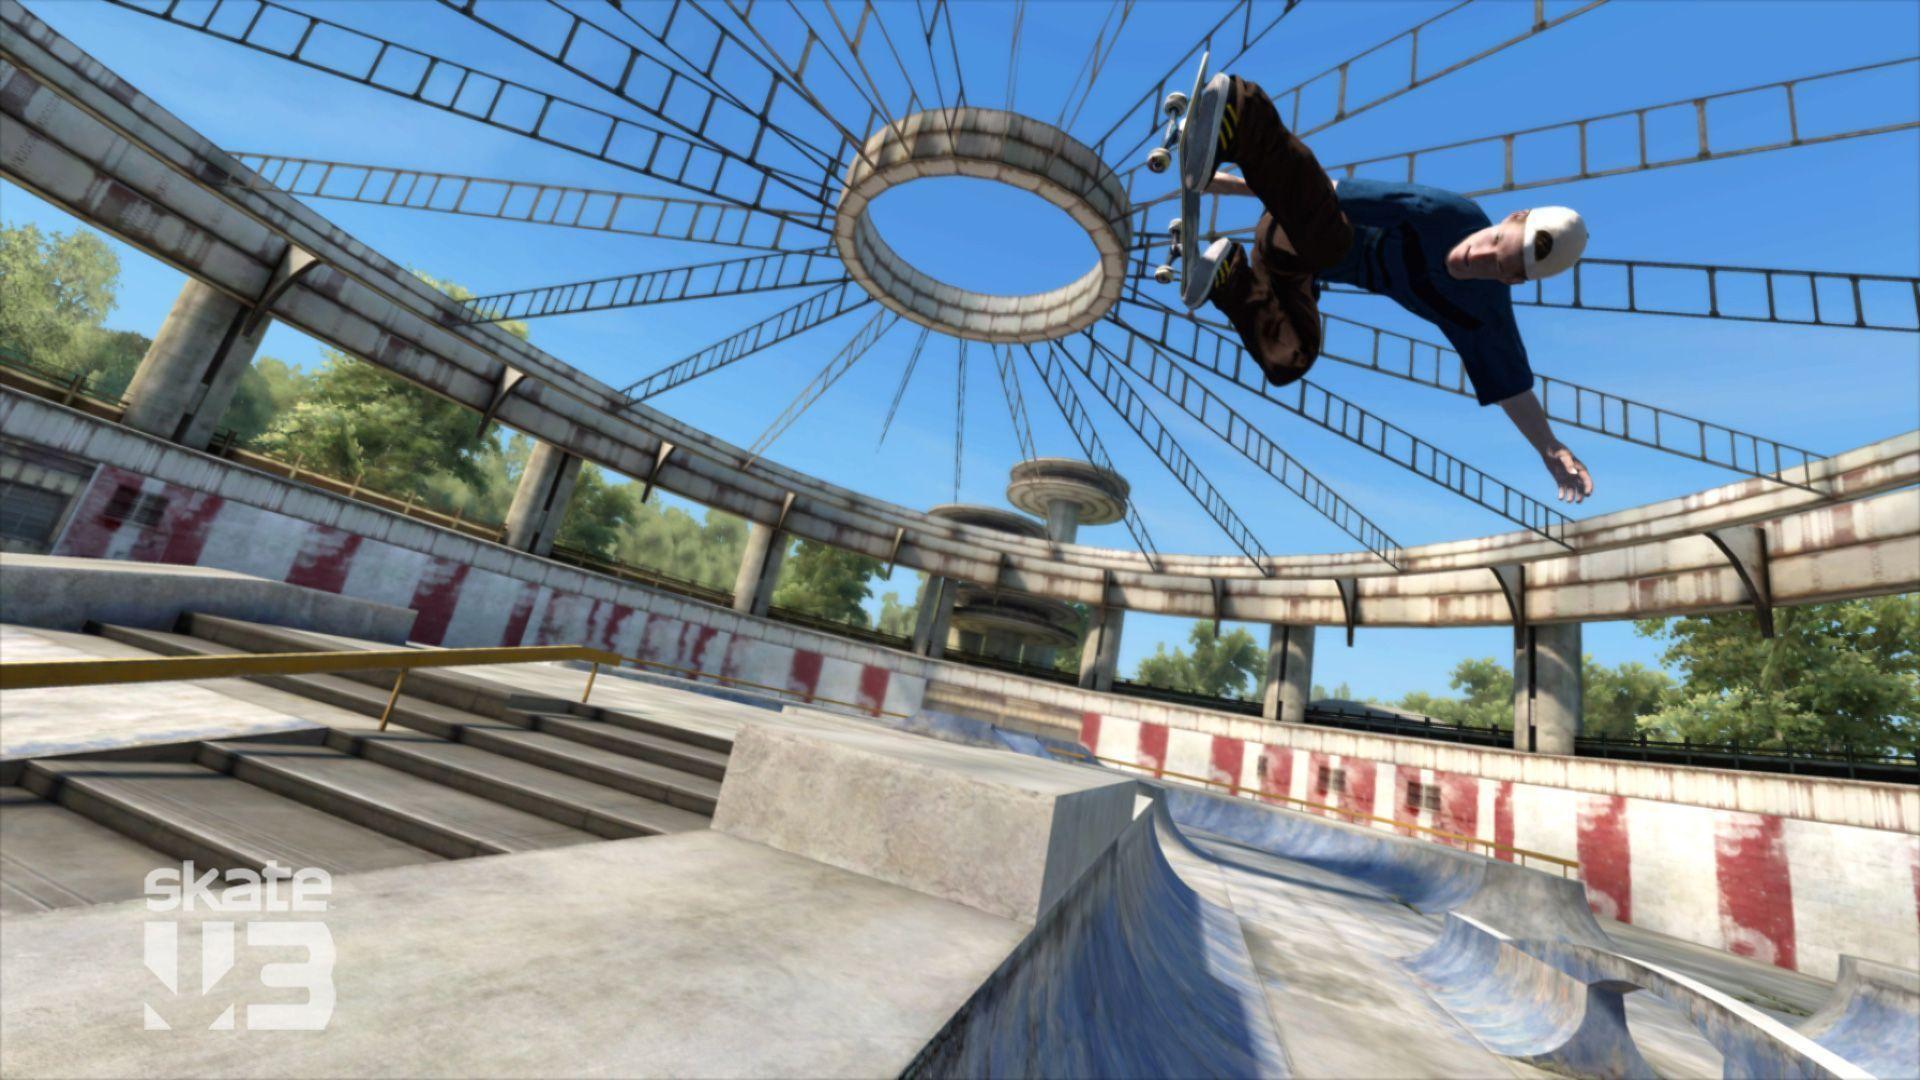 Skate 3 1080p HD Download - Games Wallpapers HD